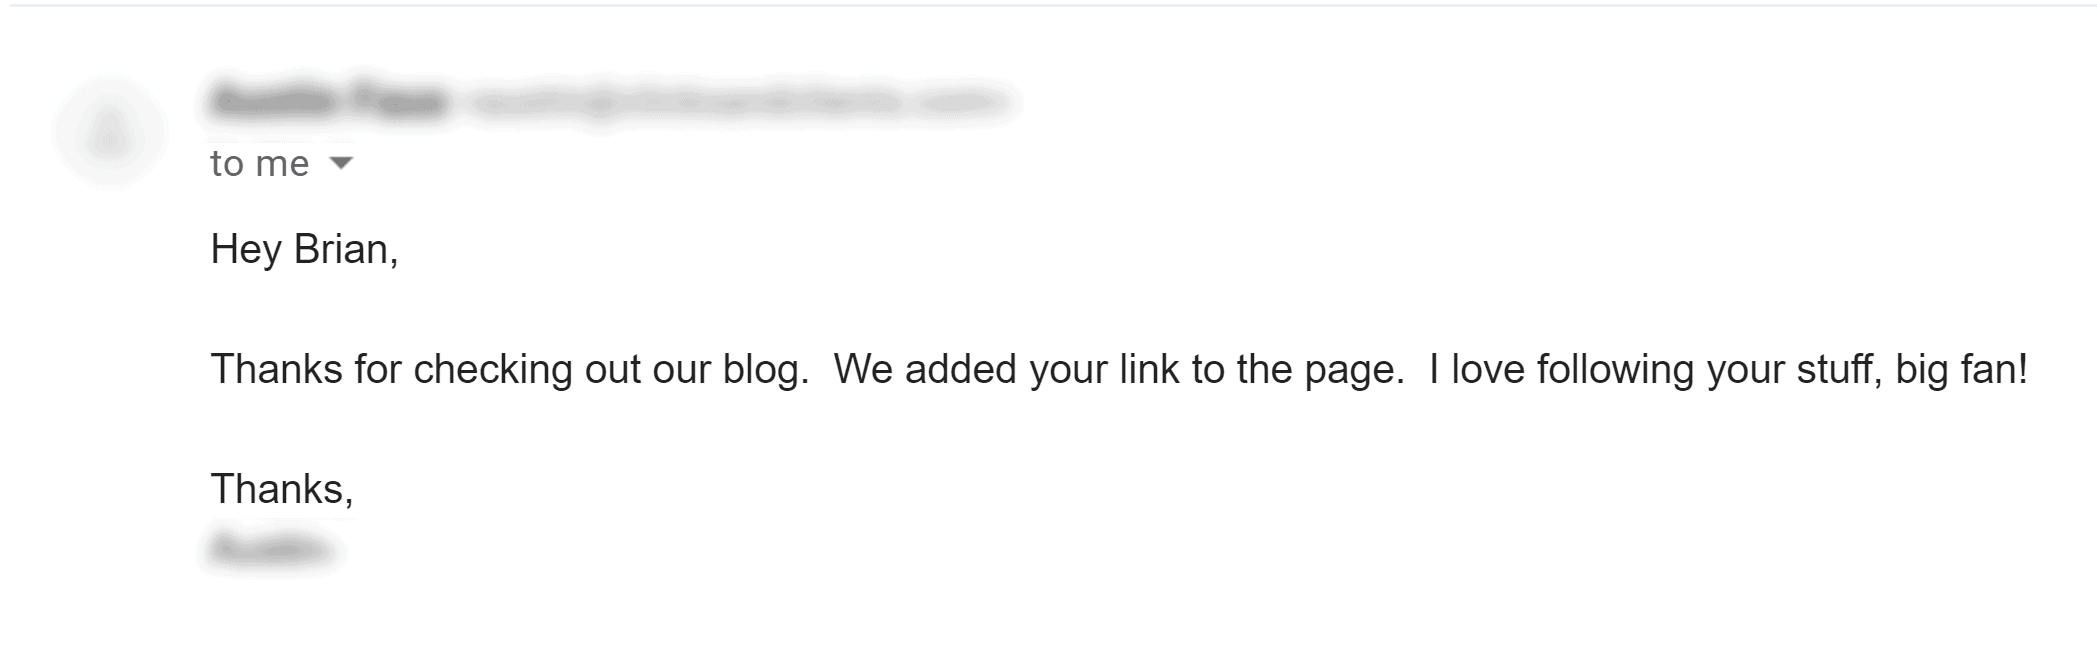 Broken link building – Response